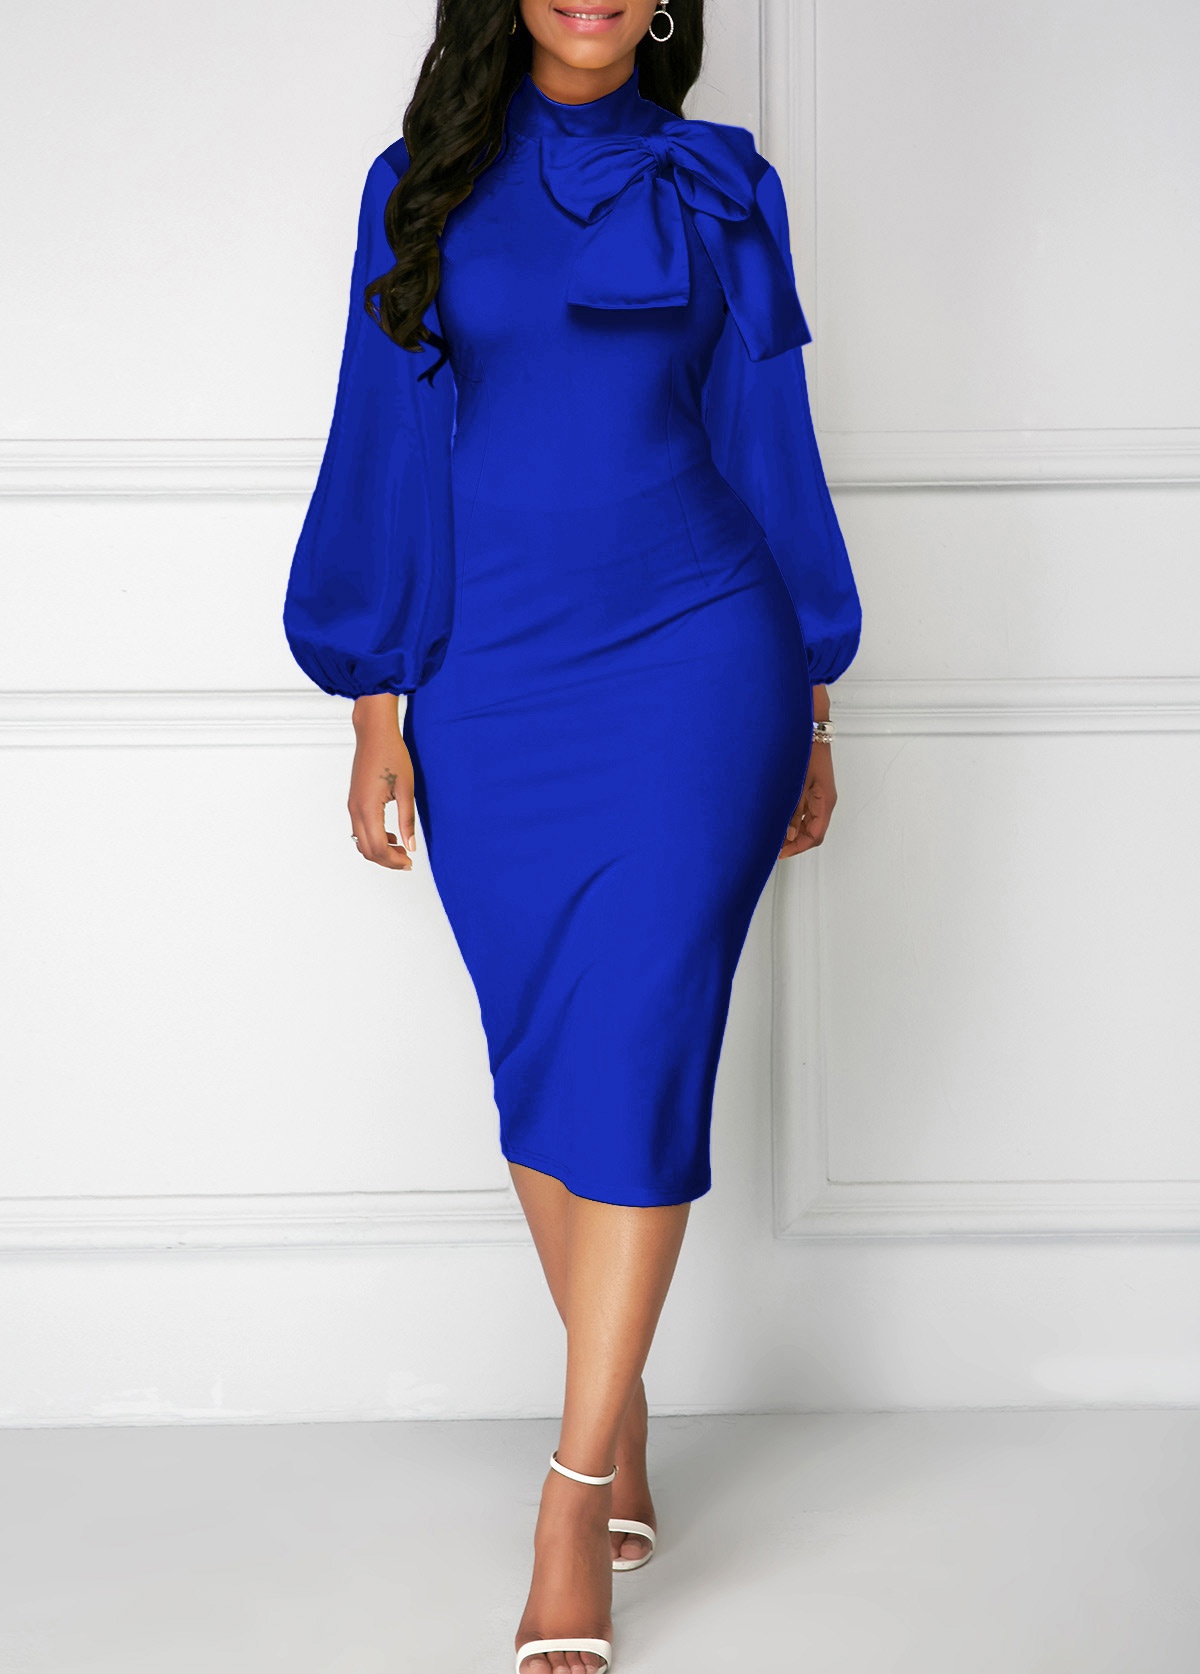 Bowknot Neck Royal Blue Lantern Sleeve Sheath Dress